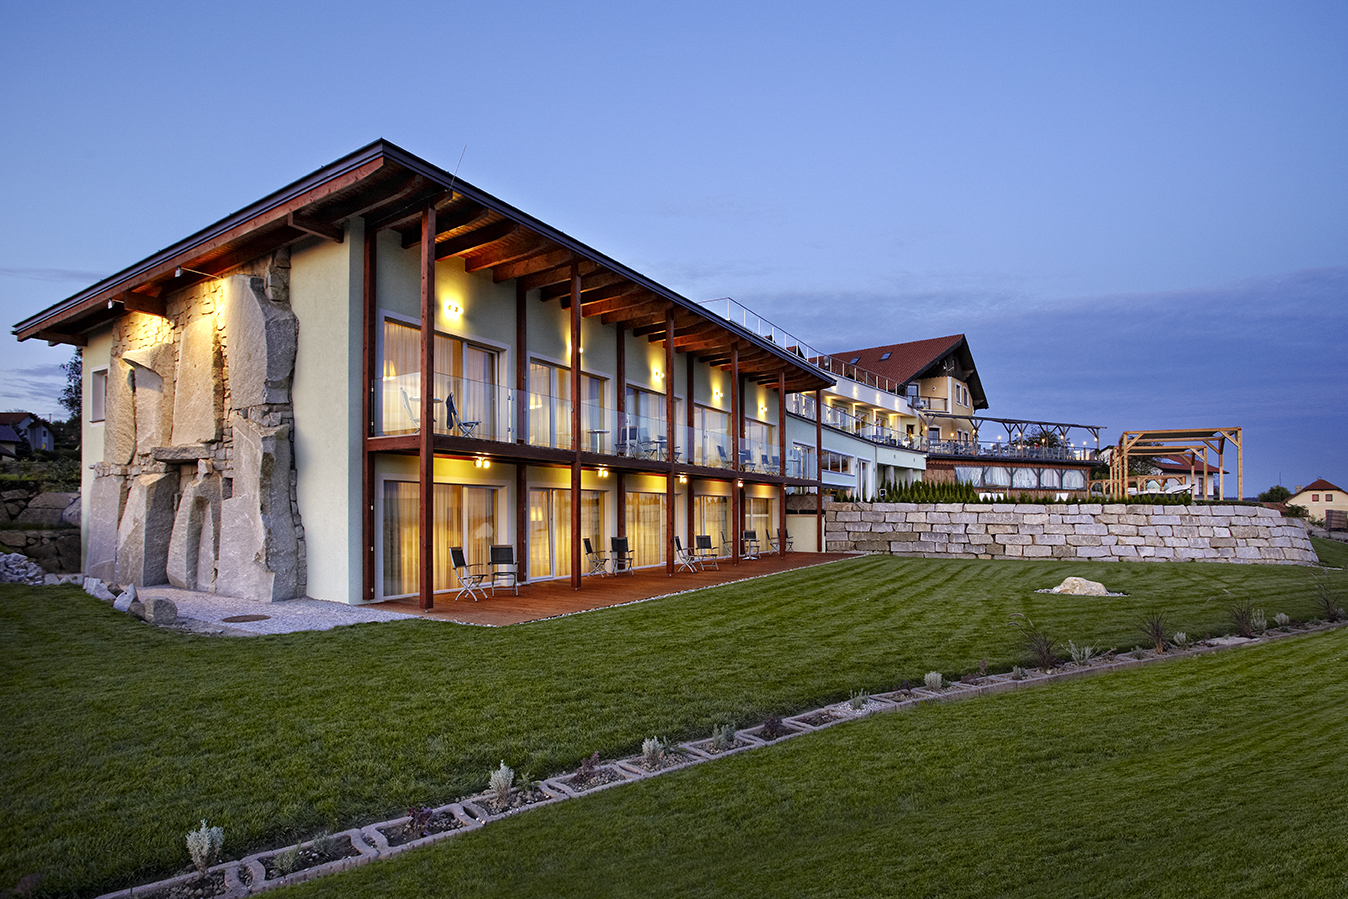 Haus aussen Kopie - Konzept-Lounge GmbH